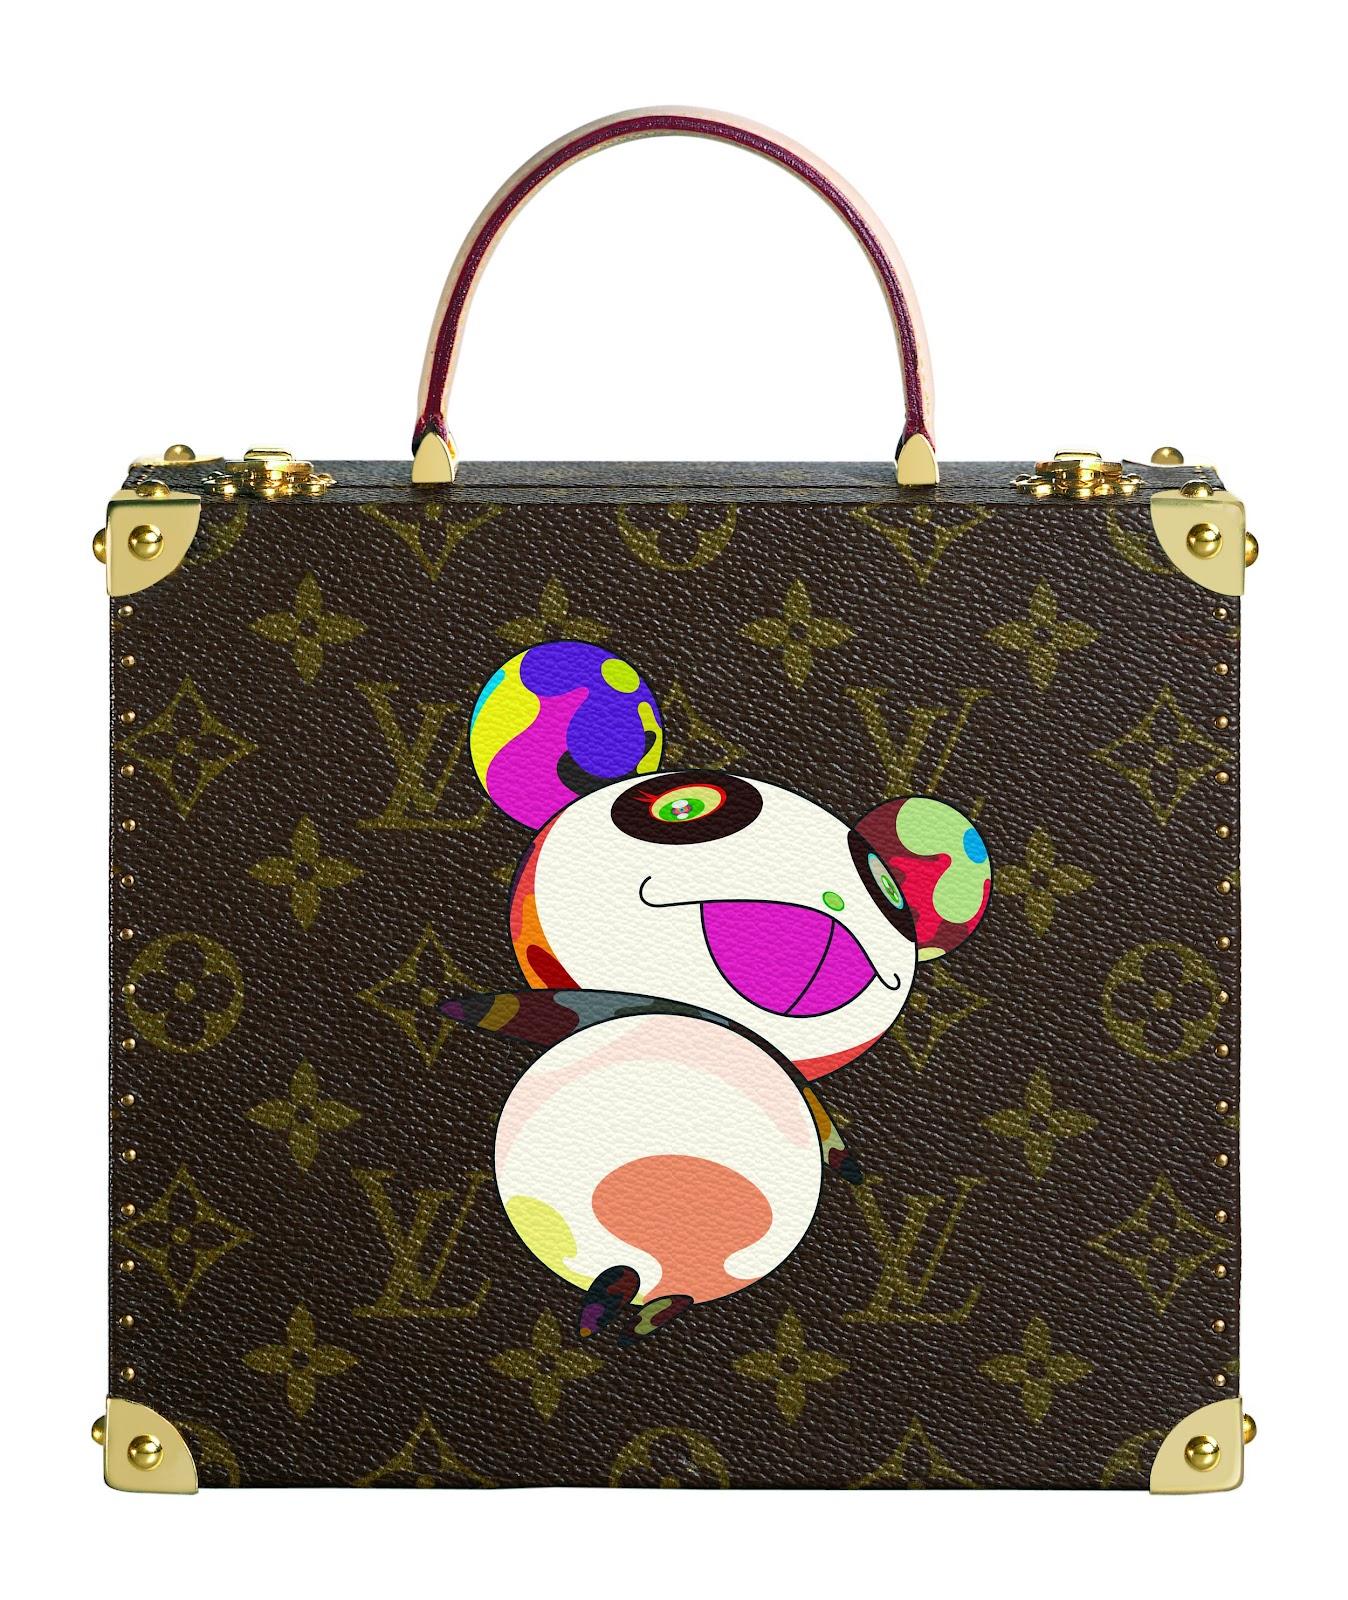 Marc Jacobs Louis Vuitton Handbags Ahoy Comics